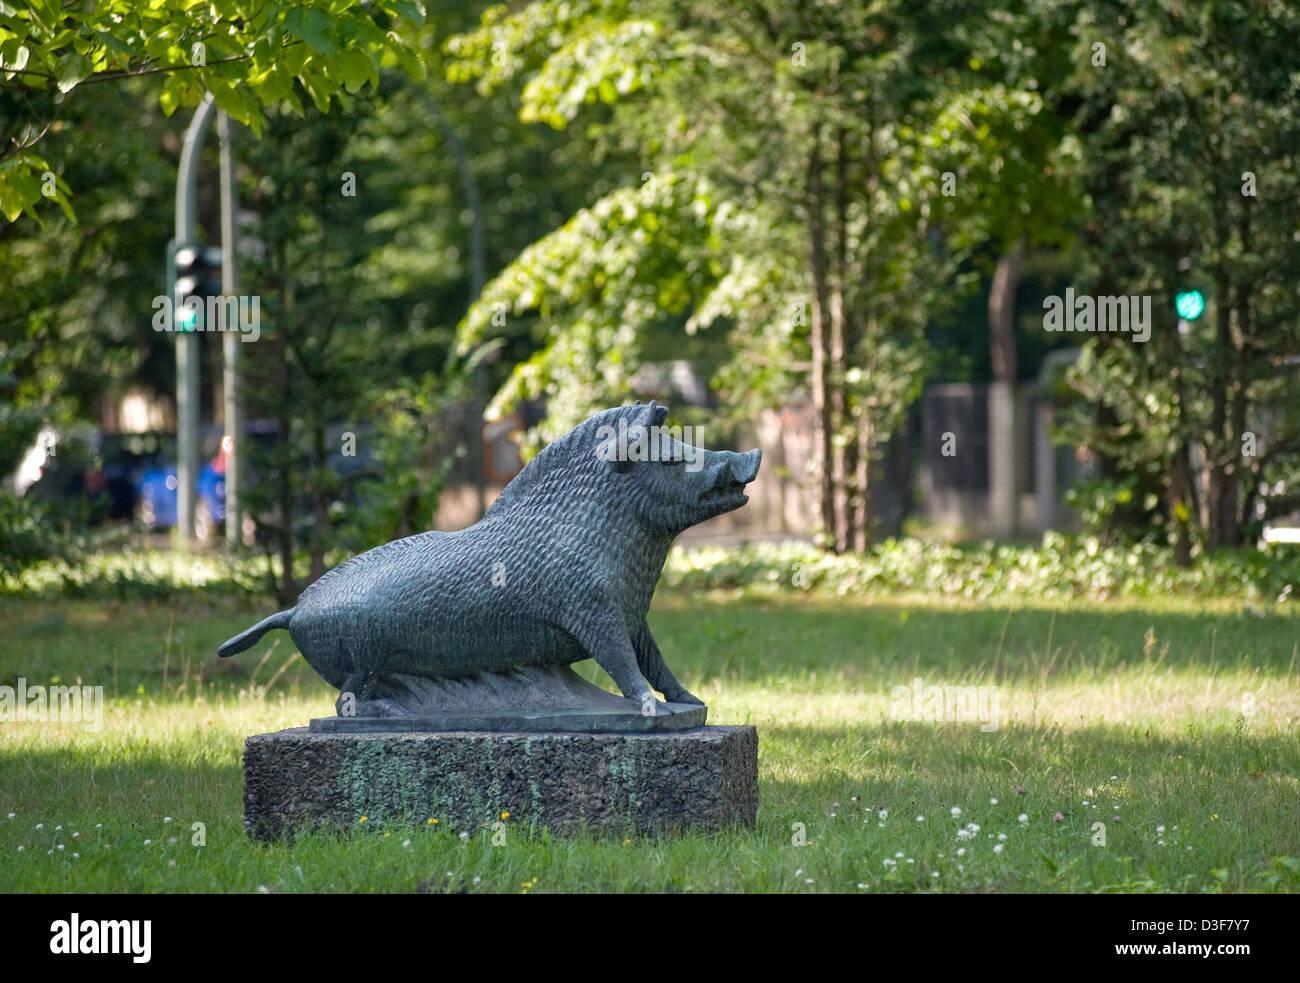 Berlin, Germany, the Wild boars by Paul Gruson in Schmargendorf - Stock Image